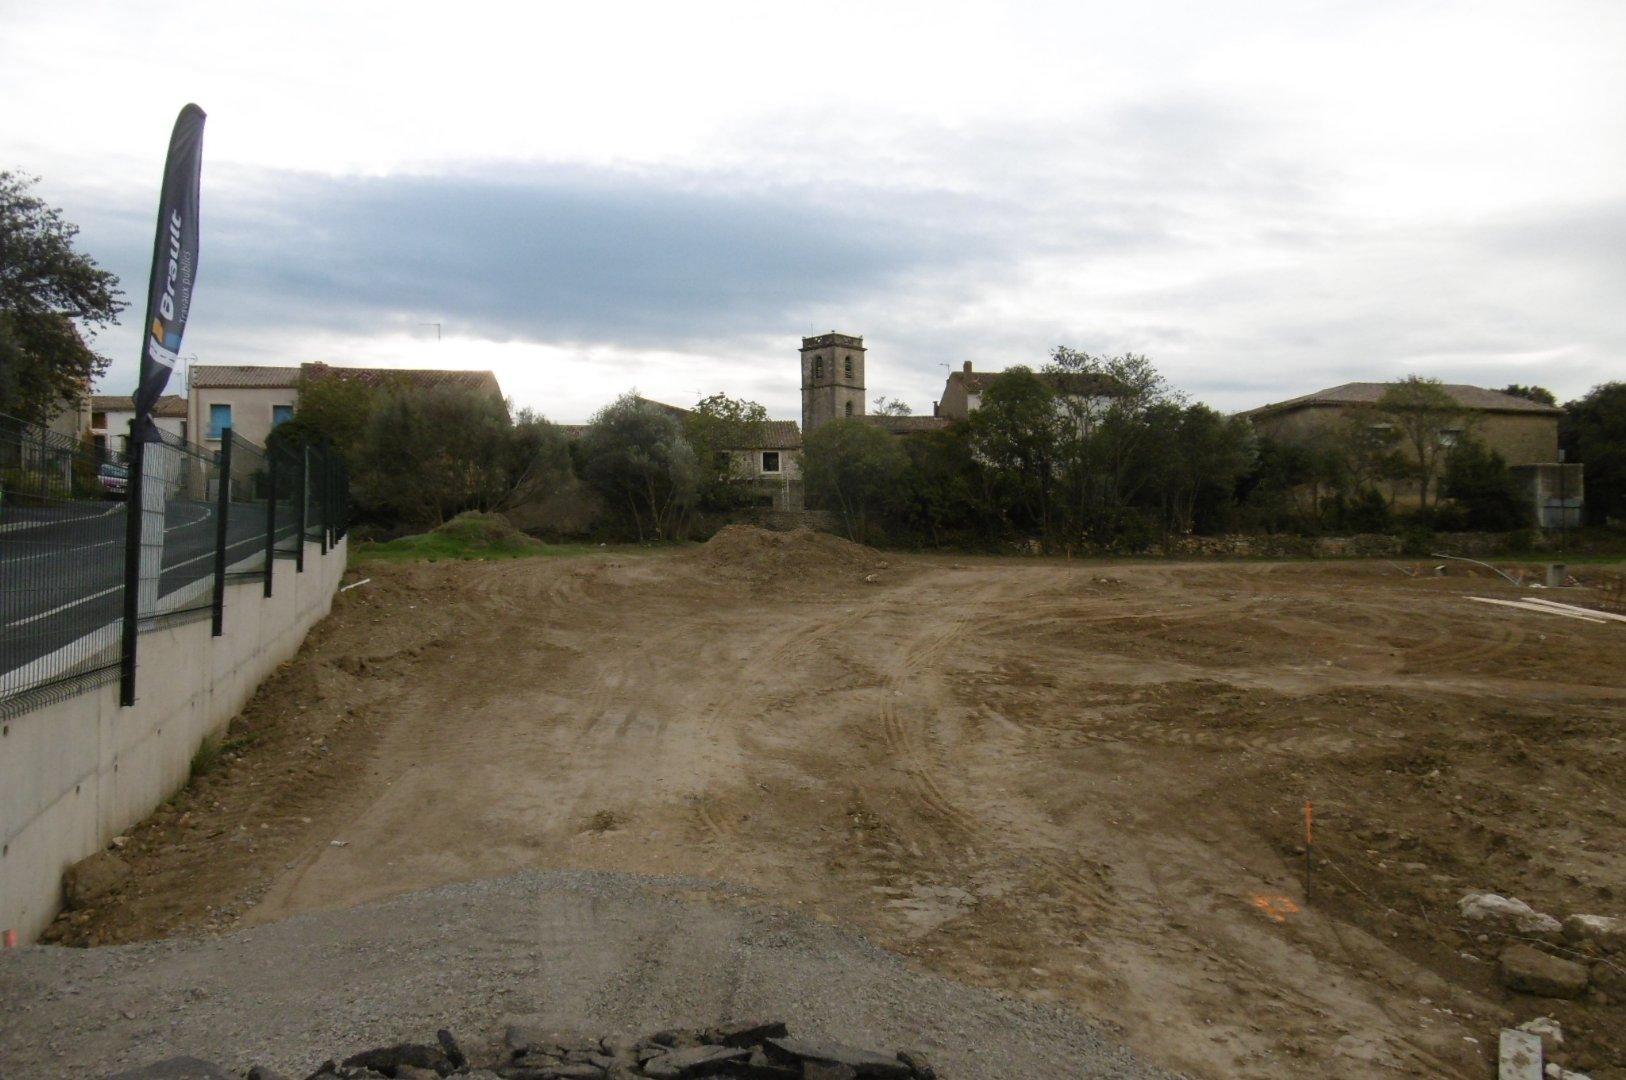 vente terrain ALIGNAN DU VENT ALIGNAN DU VENT 34290